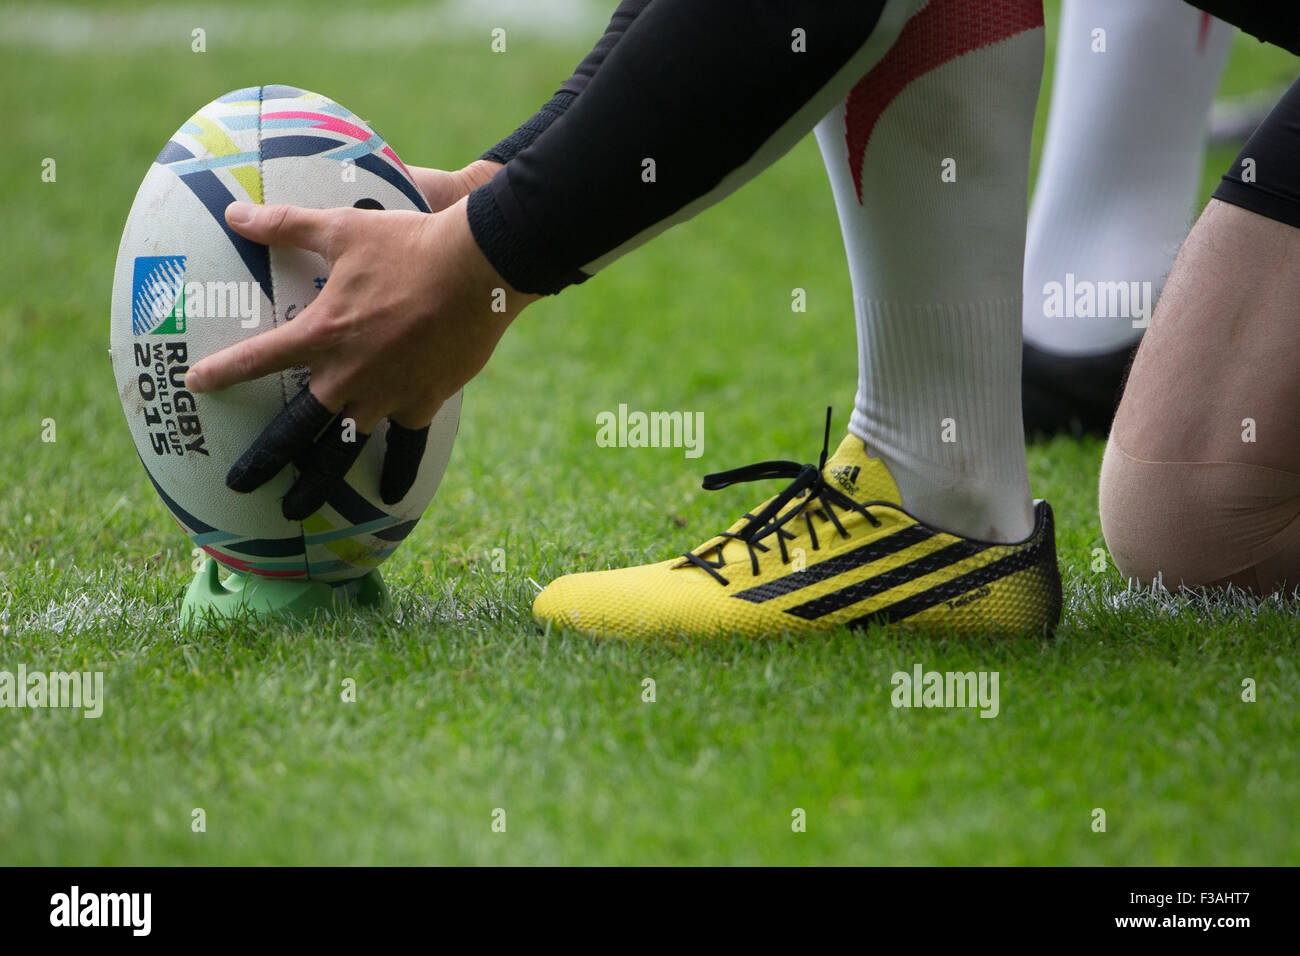 Stadion MK, Milton Keynes, UK. 3. Oktober 2015. Rugby WM 2015 Spiel 24 - Samoa V Japan. Bildnachweis: Chris Yates/Alamy Stockbild